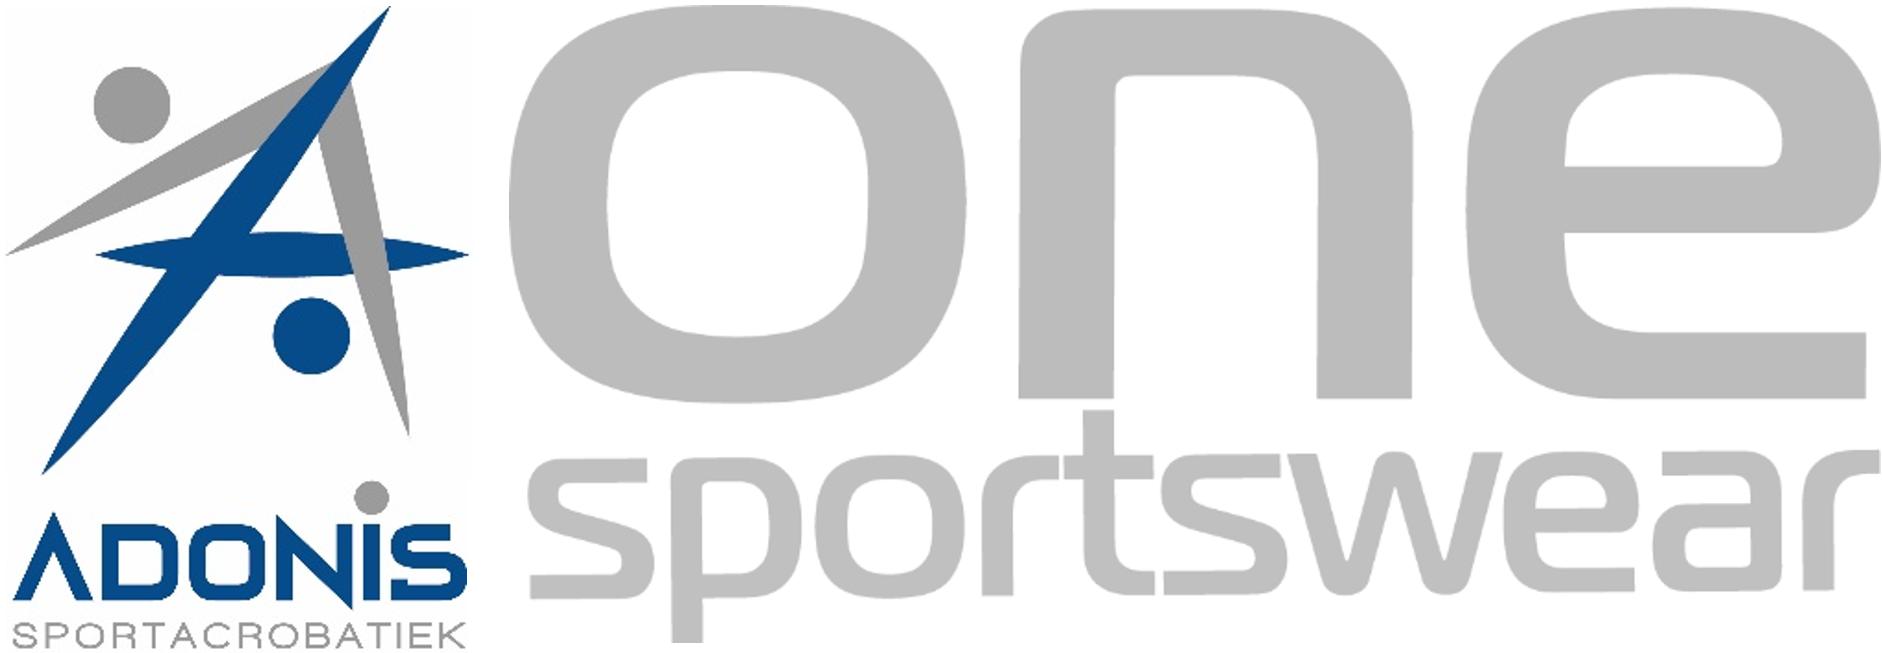 One sportswear - Adonis